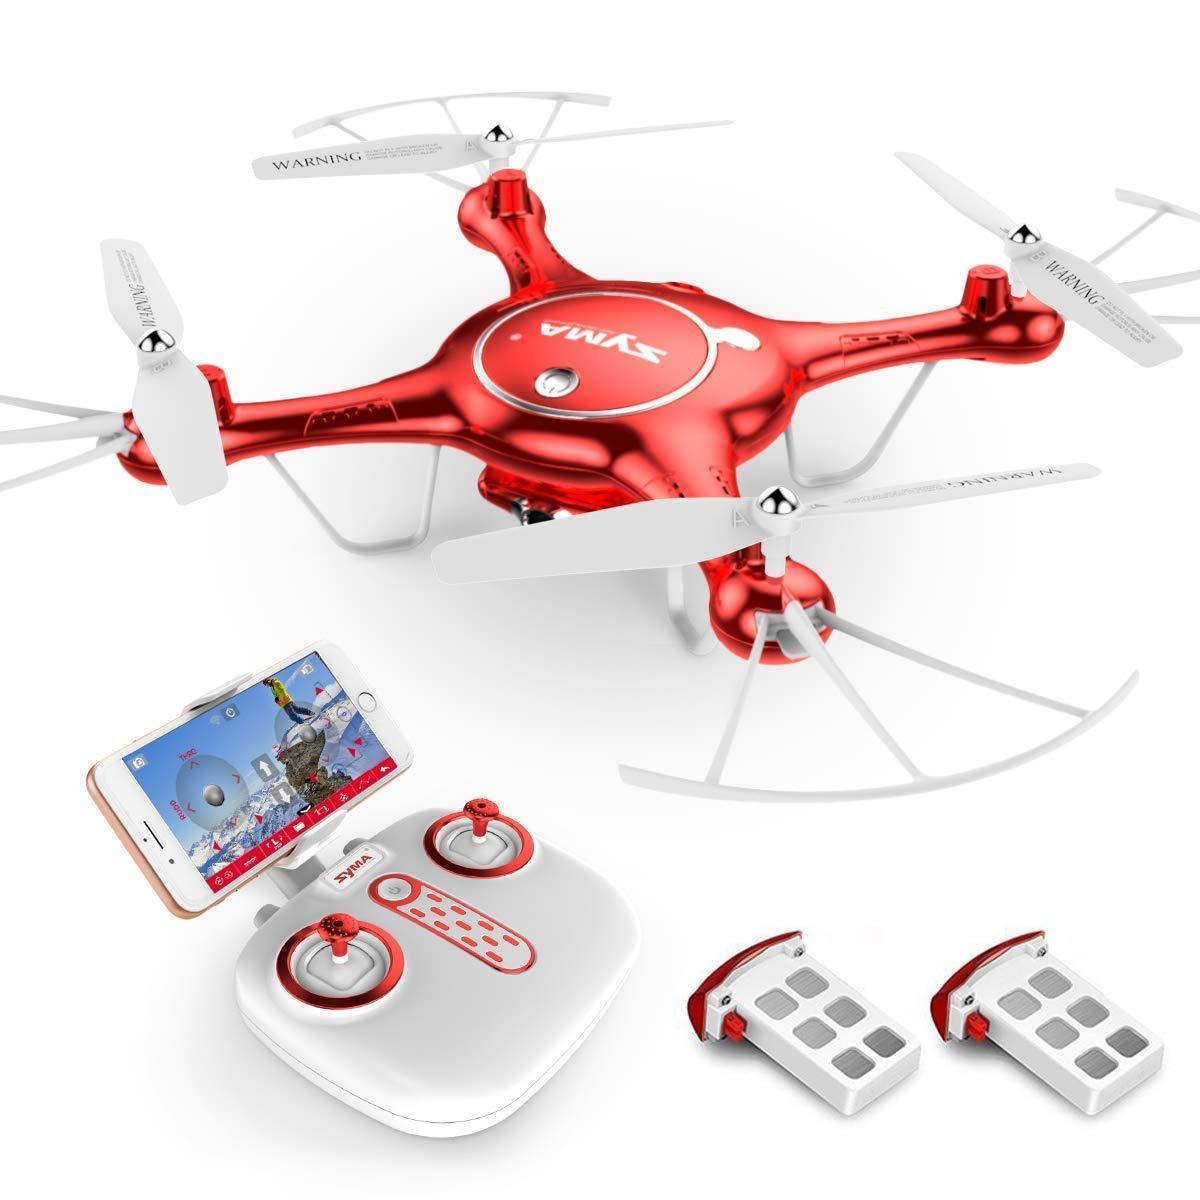 Квадрокоптер SYMA X5UW FPV 720P HD Wi-Fi камера + Видеокарта + бонус-батарея Красный